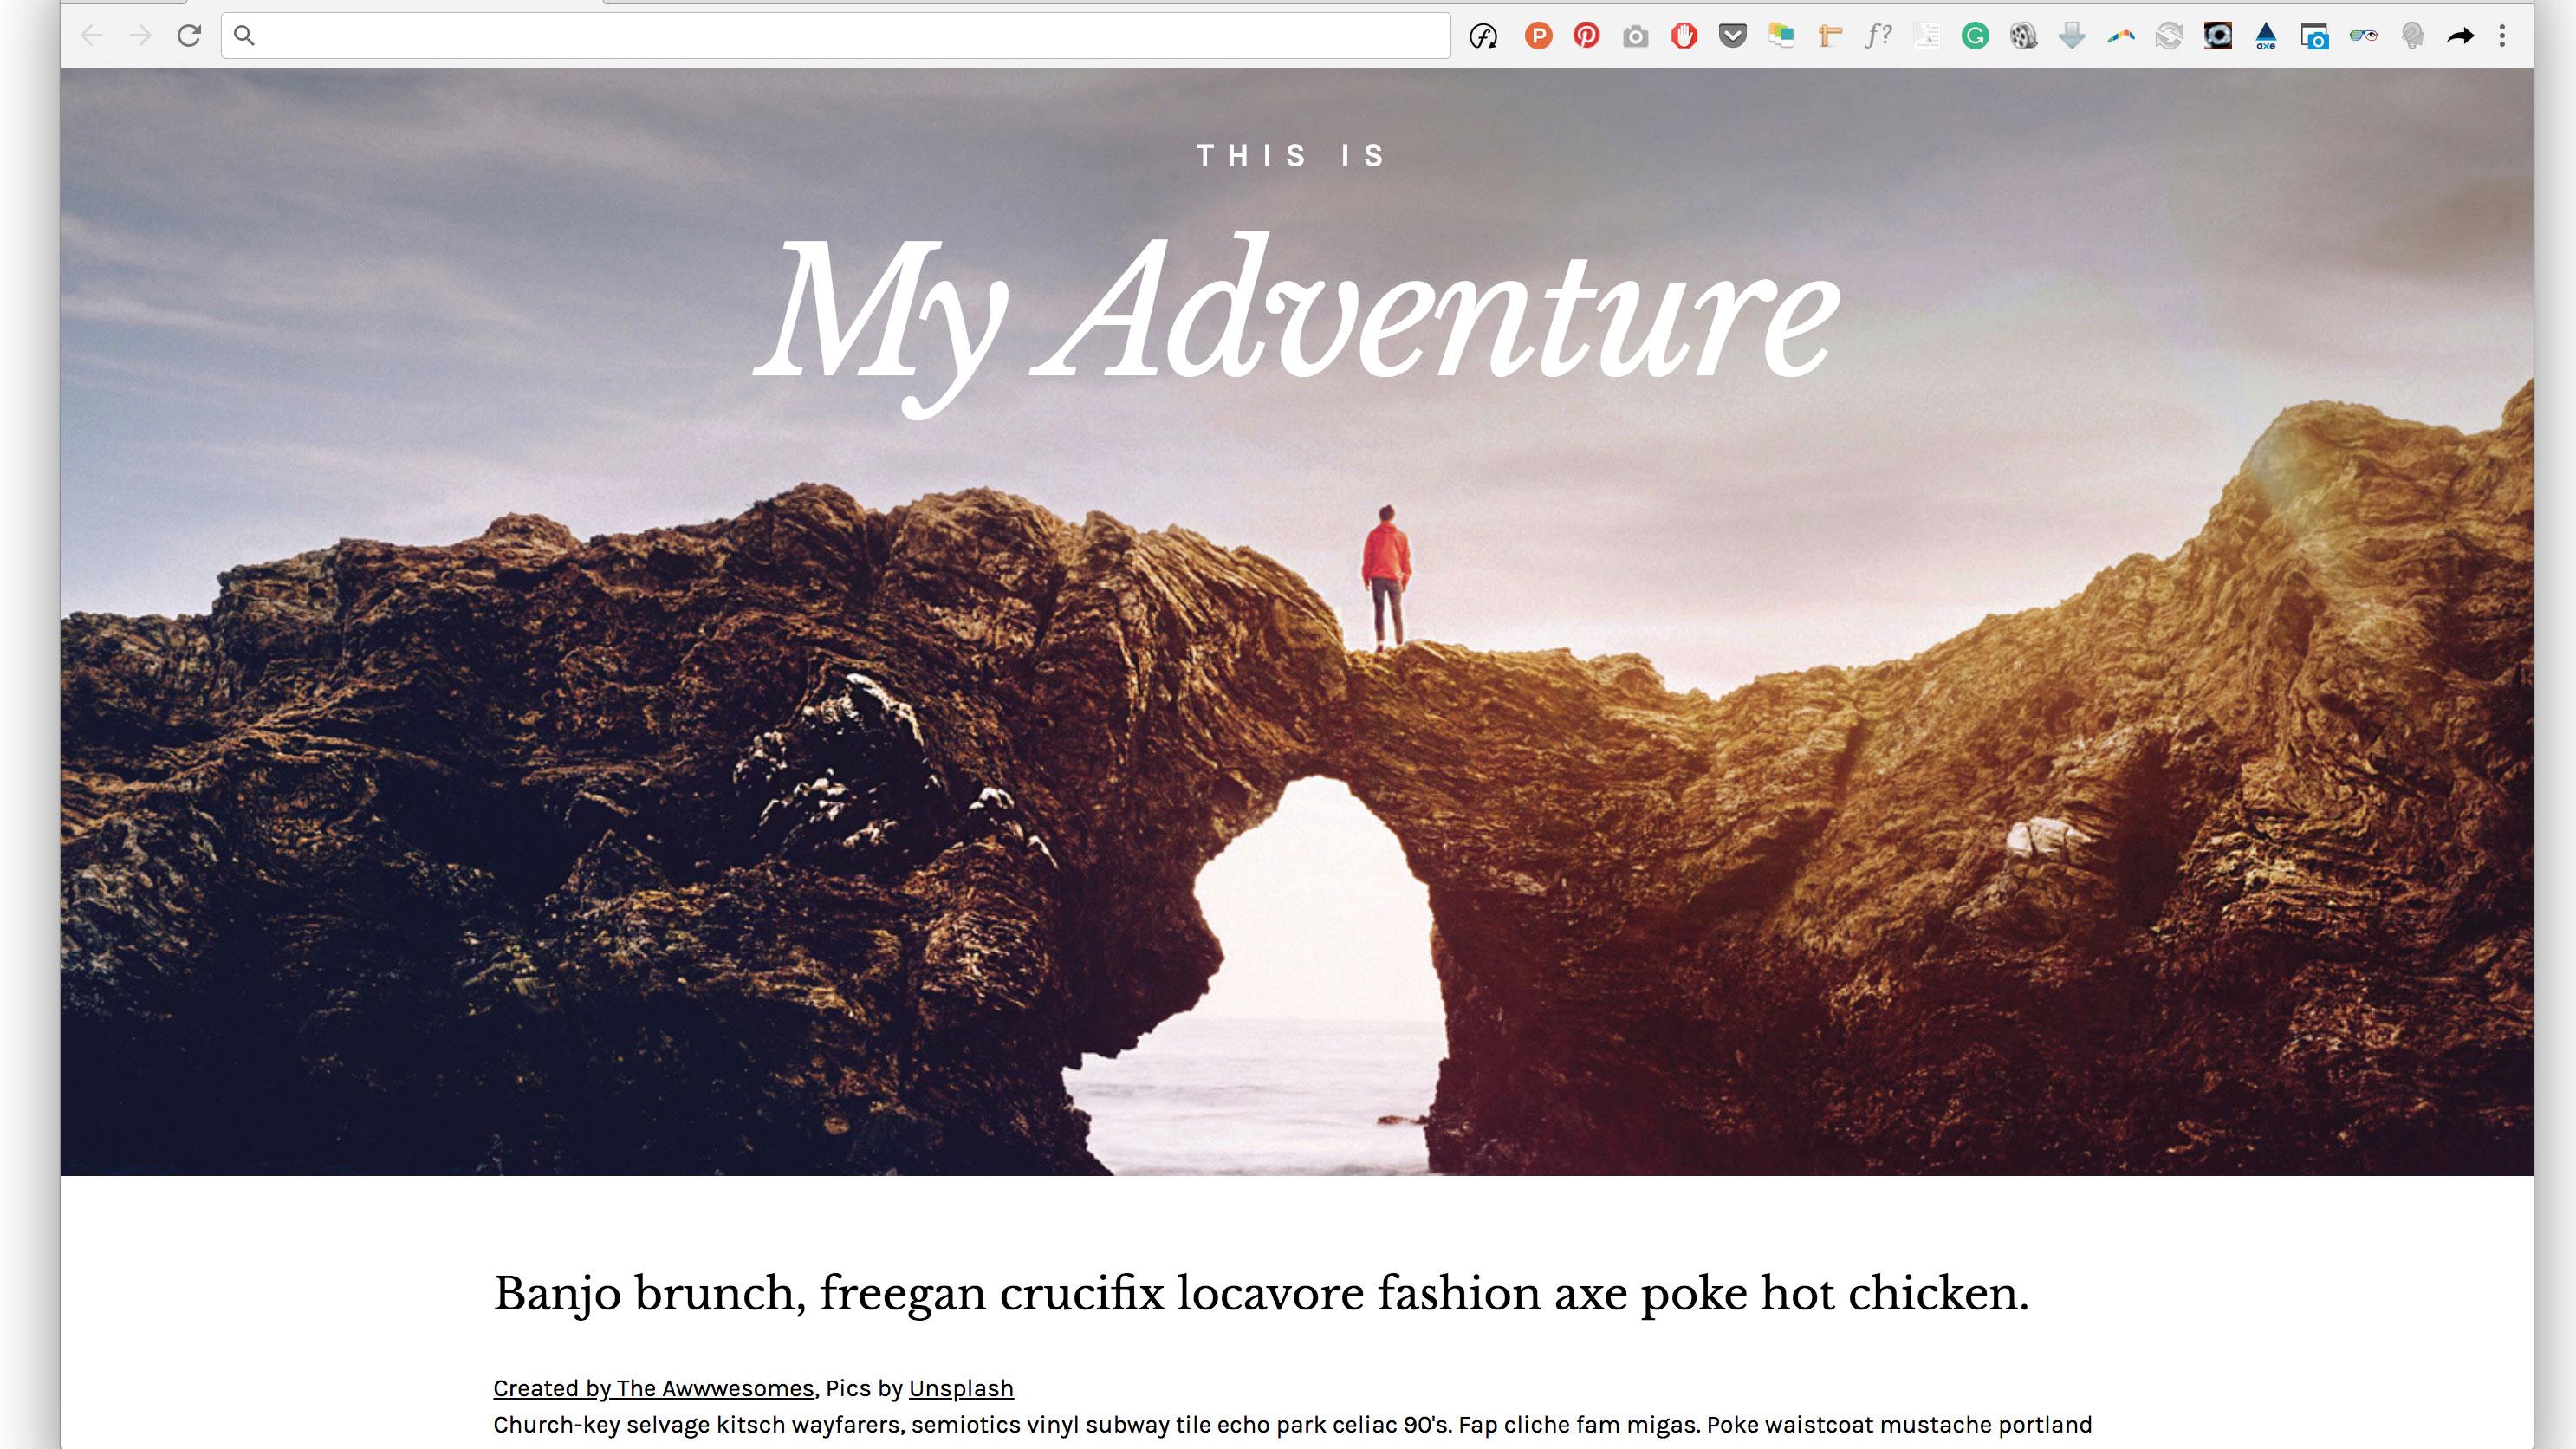 Web Design Resources - Magazine cover